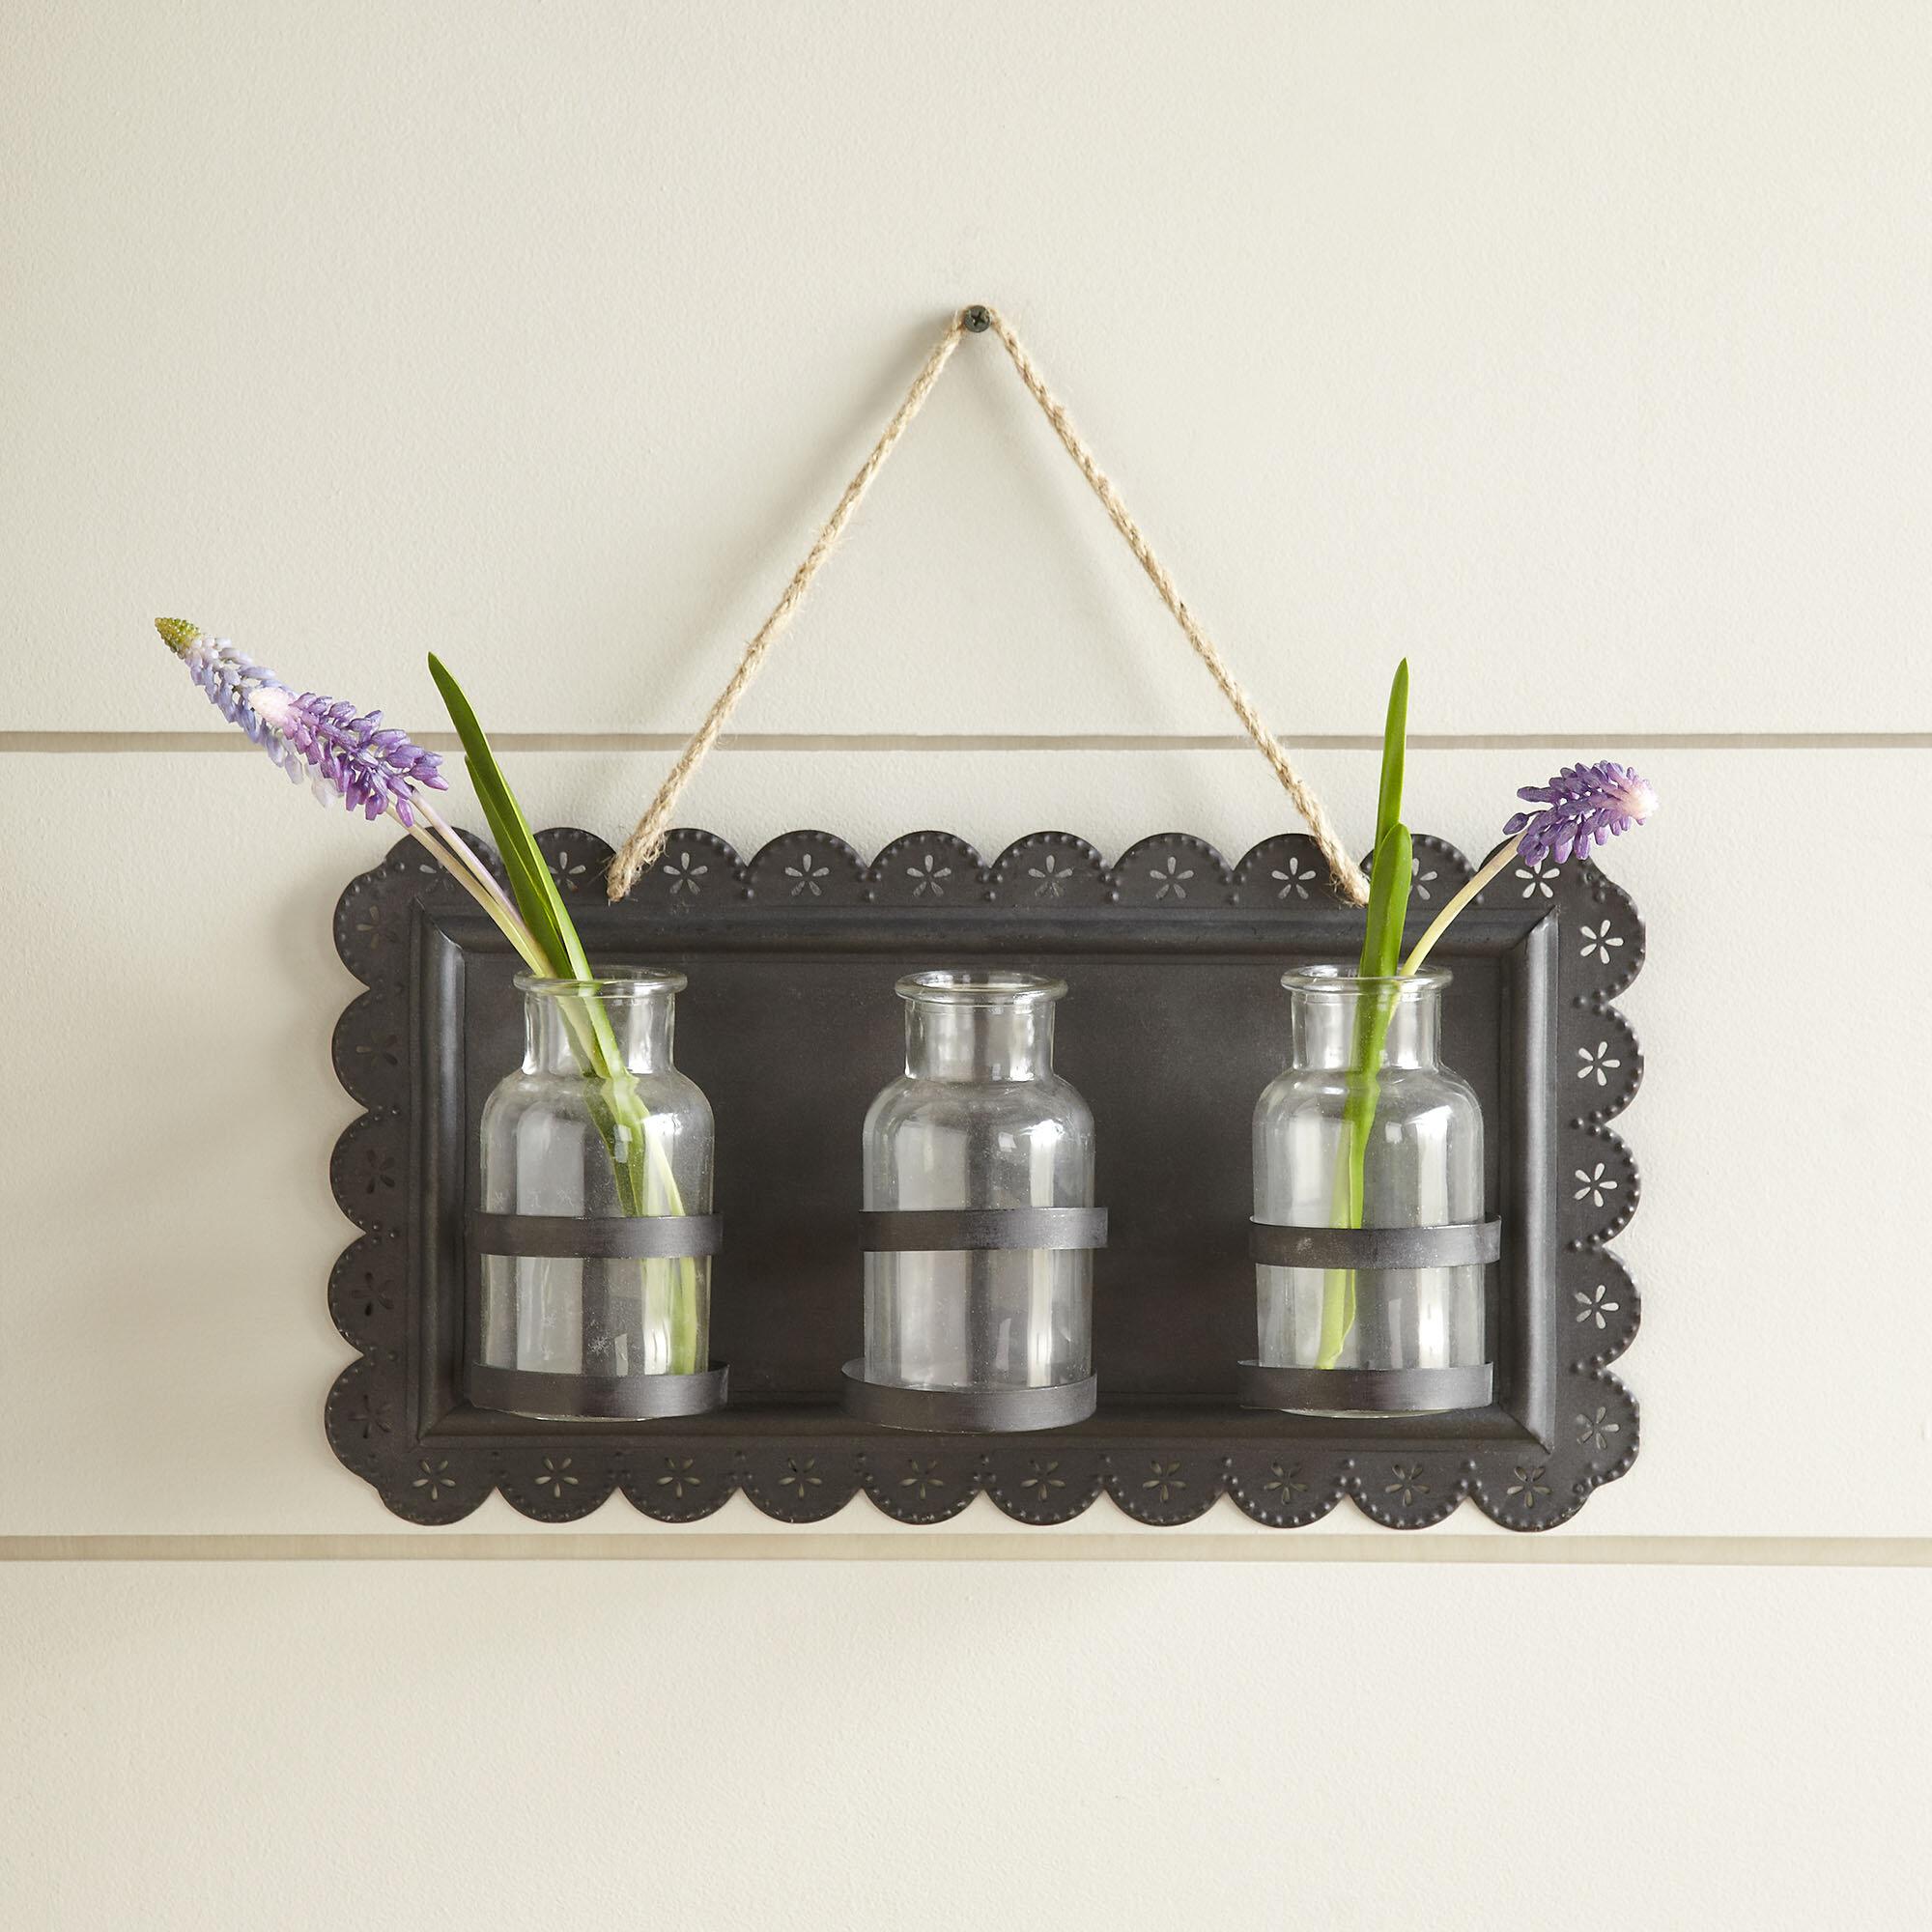 Tin hanging decor wall vase reviews birch lane reviewsmspy